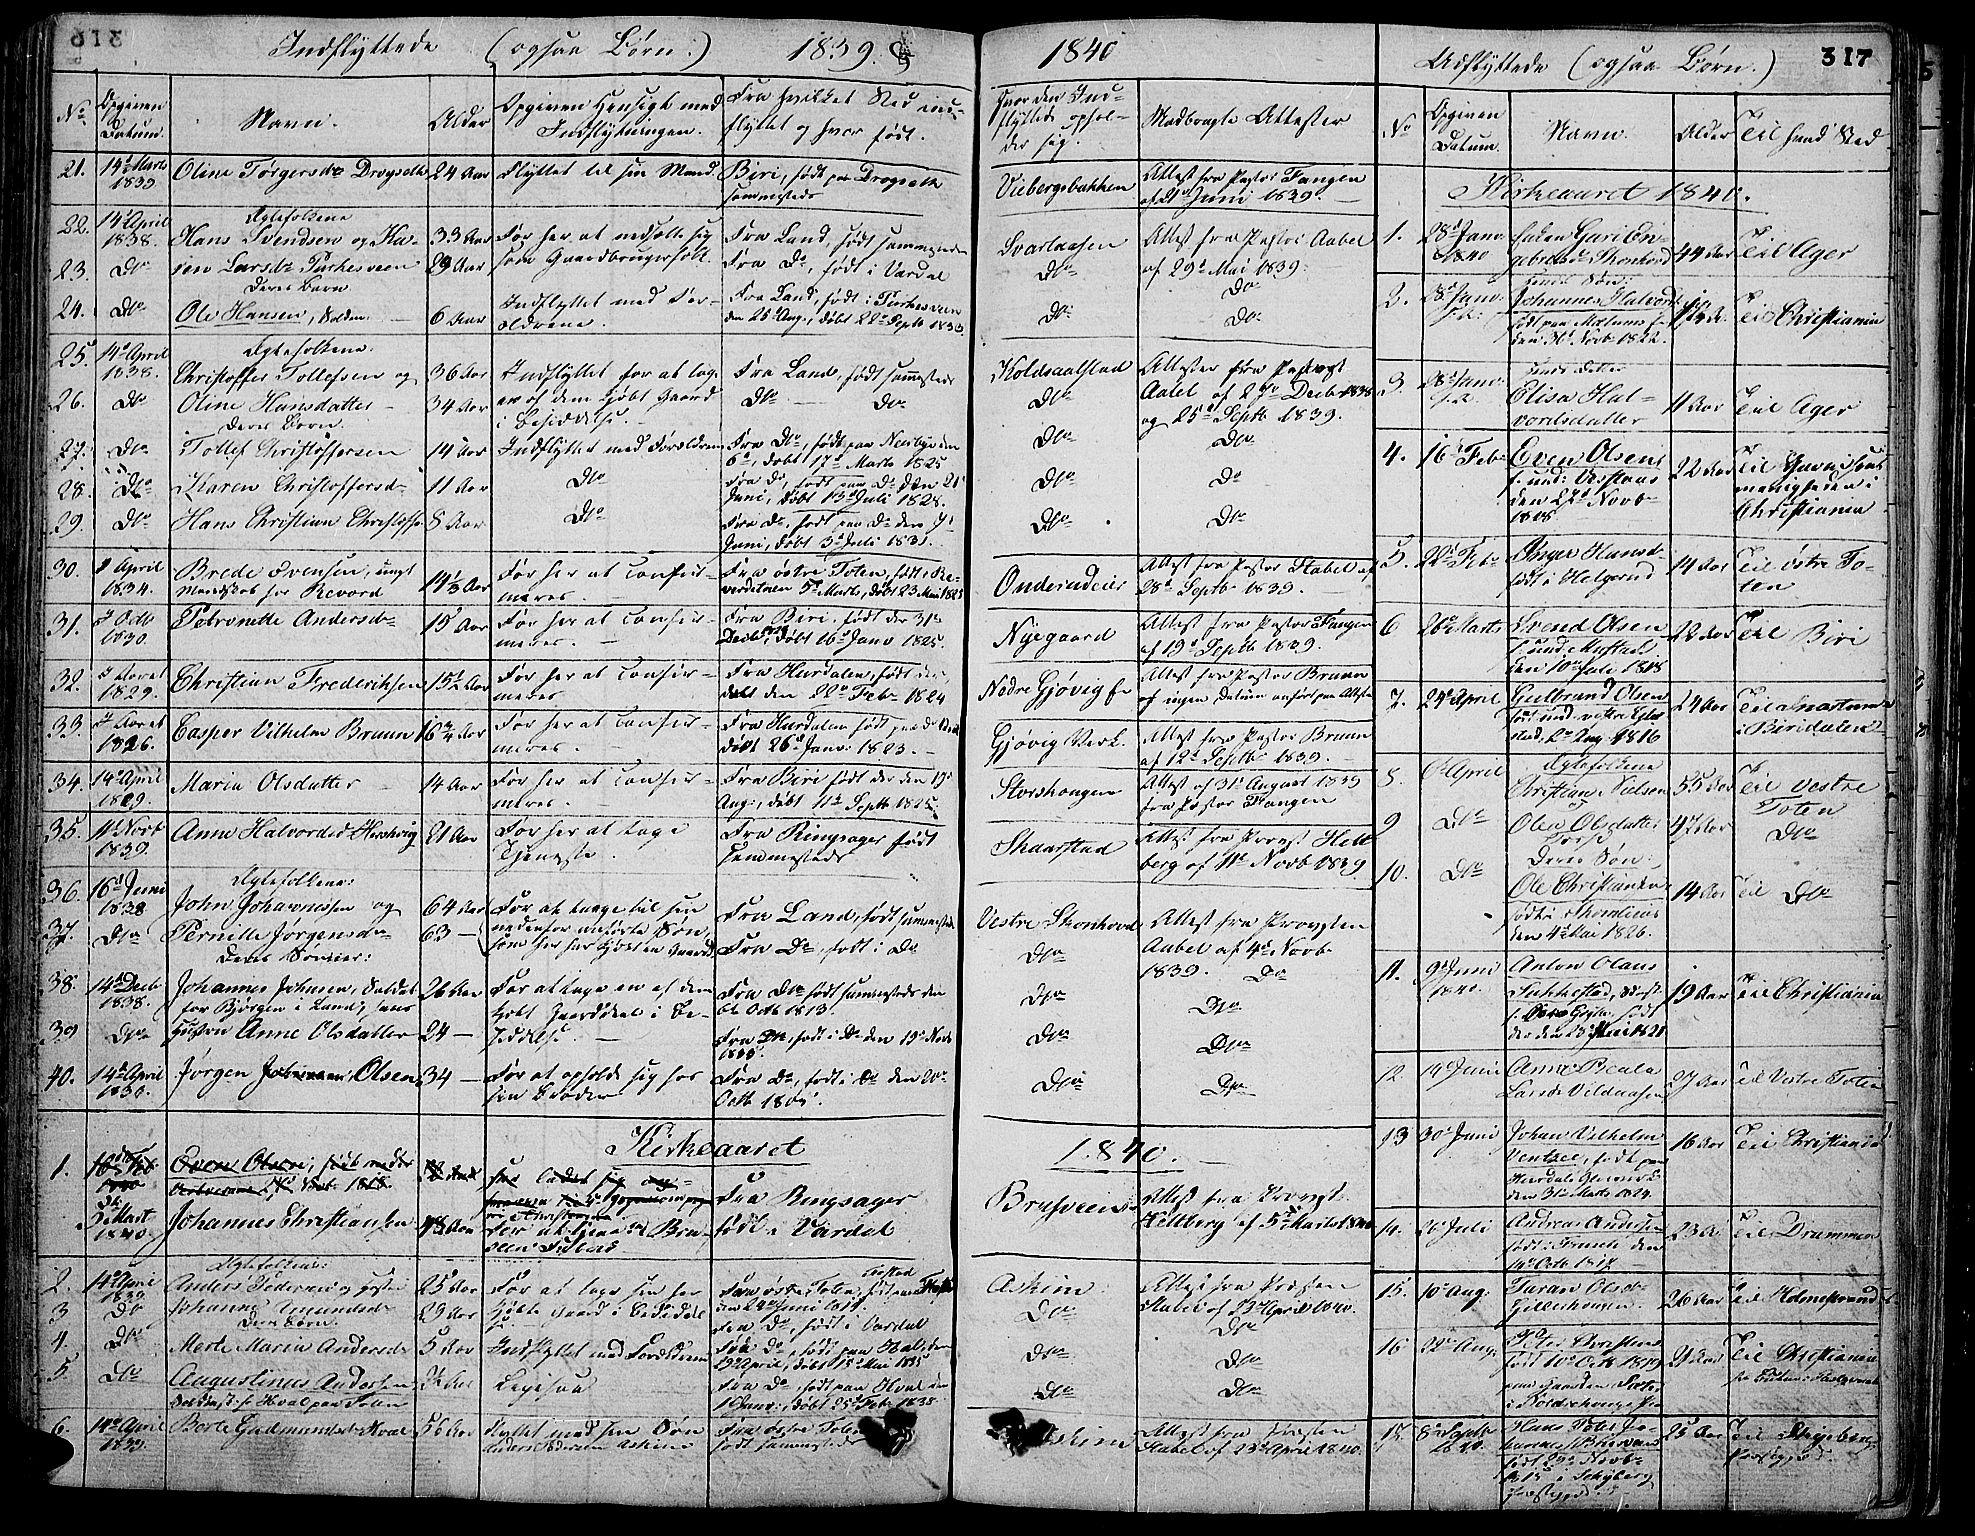 SAH, Vardal prestekontor, H/Ha/Hab/L0004: Klokkerbok nr. 4, 1831-1853, s. 317